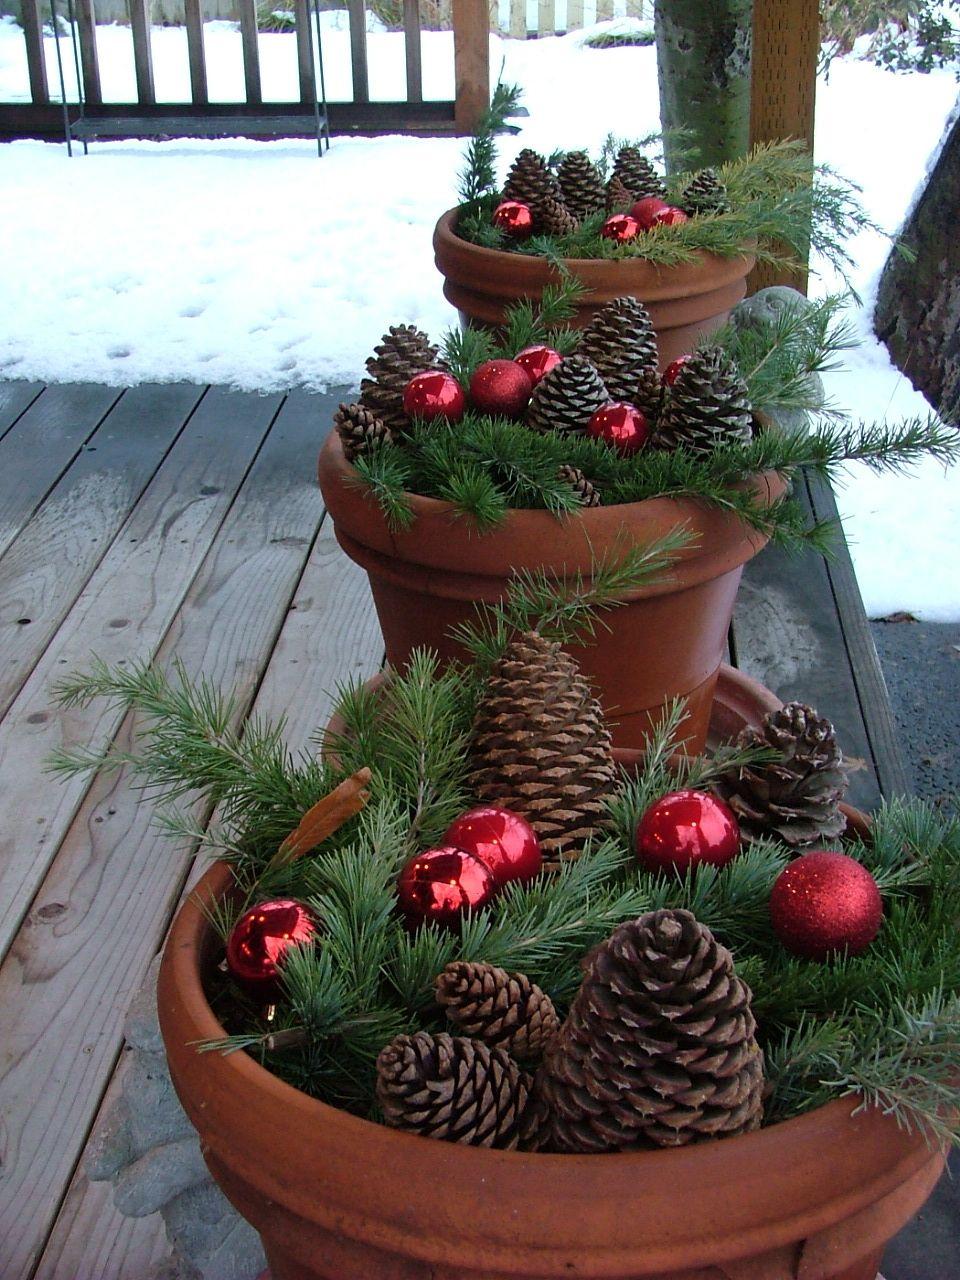 Homemade christmas decorations pinterest - Homemade Christmas Decorations Pinterest